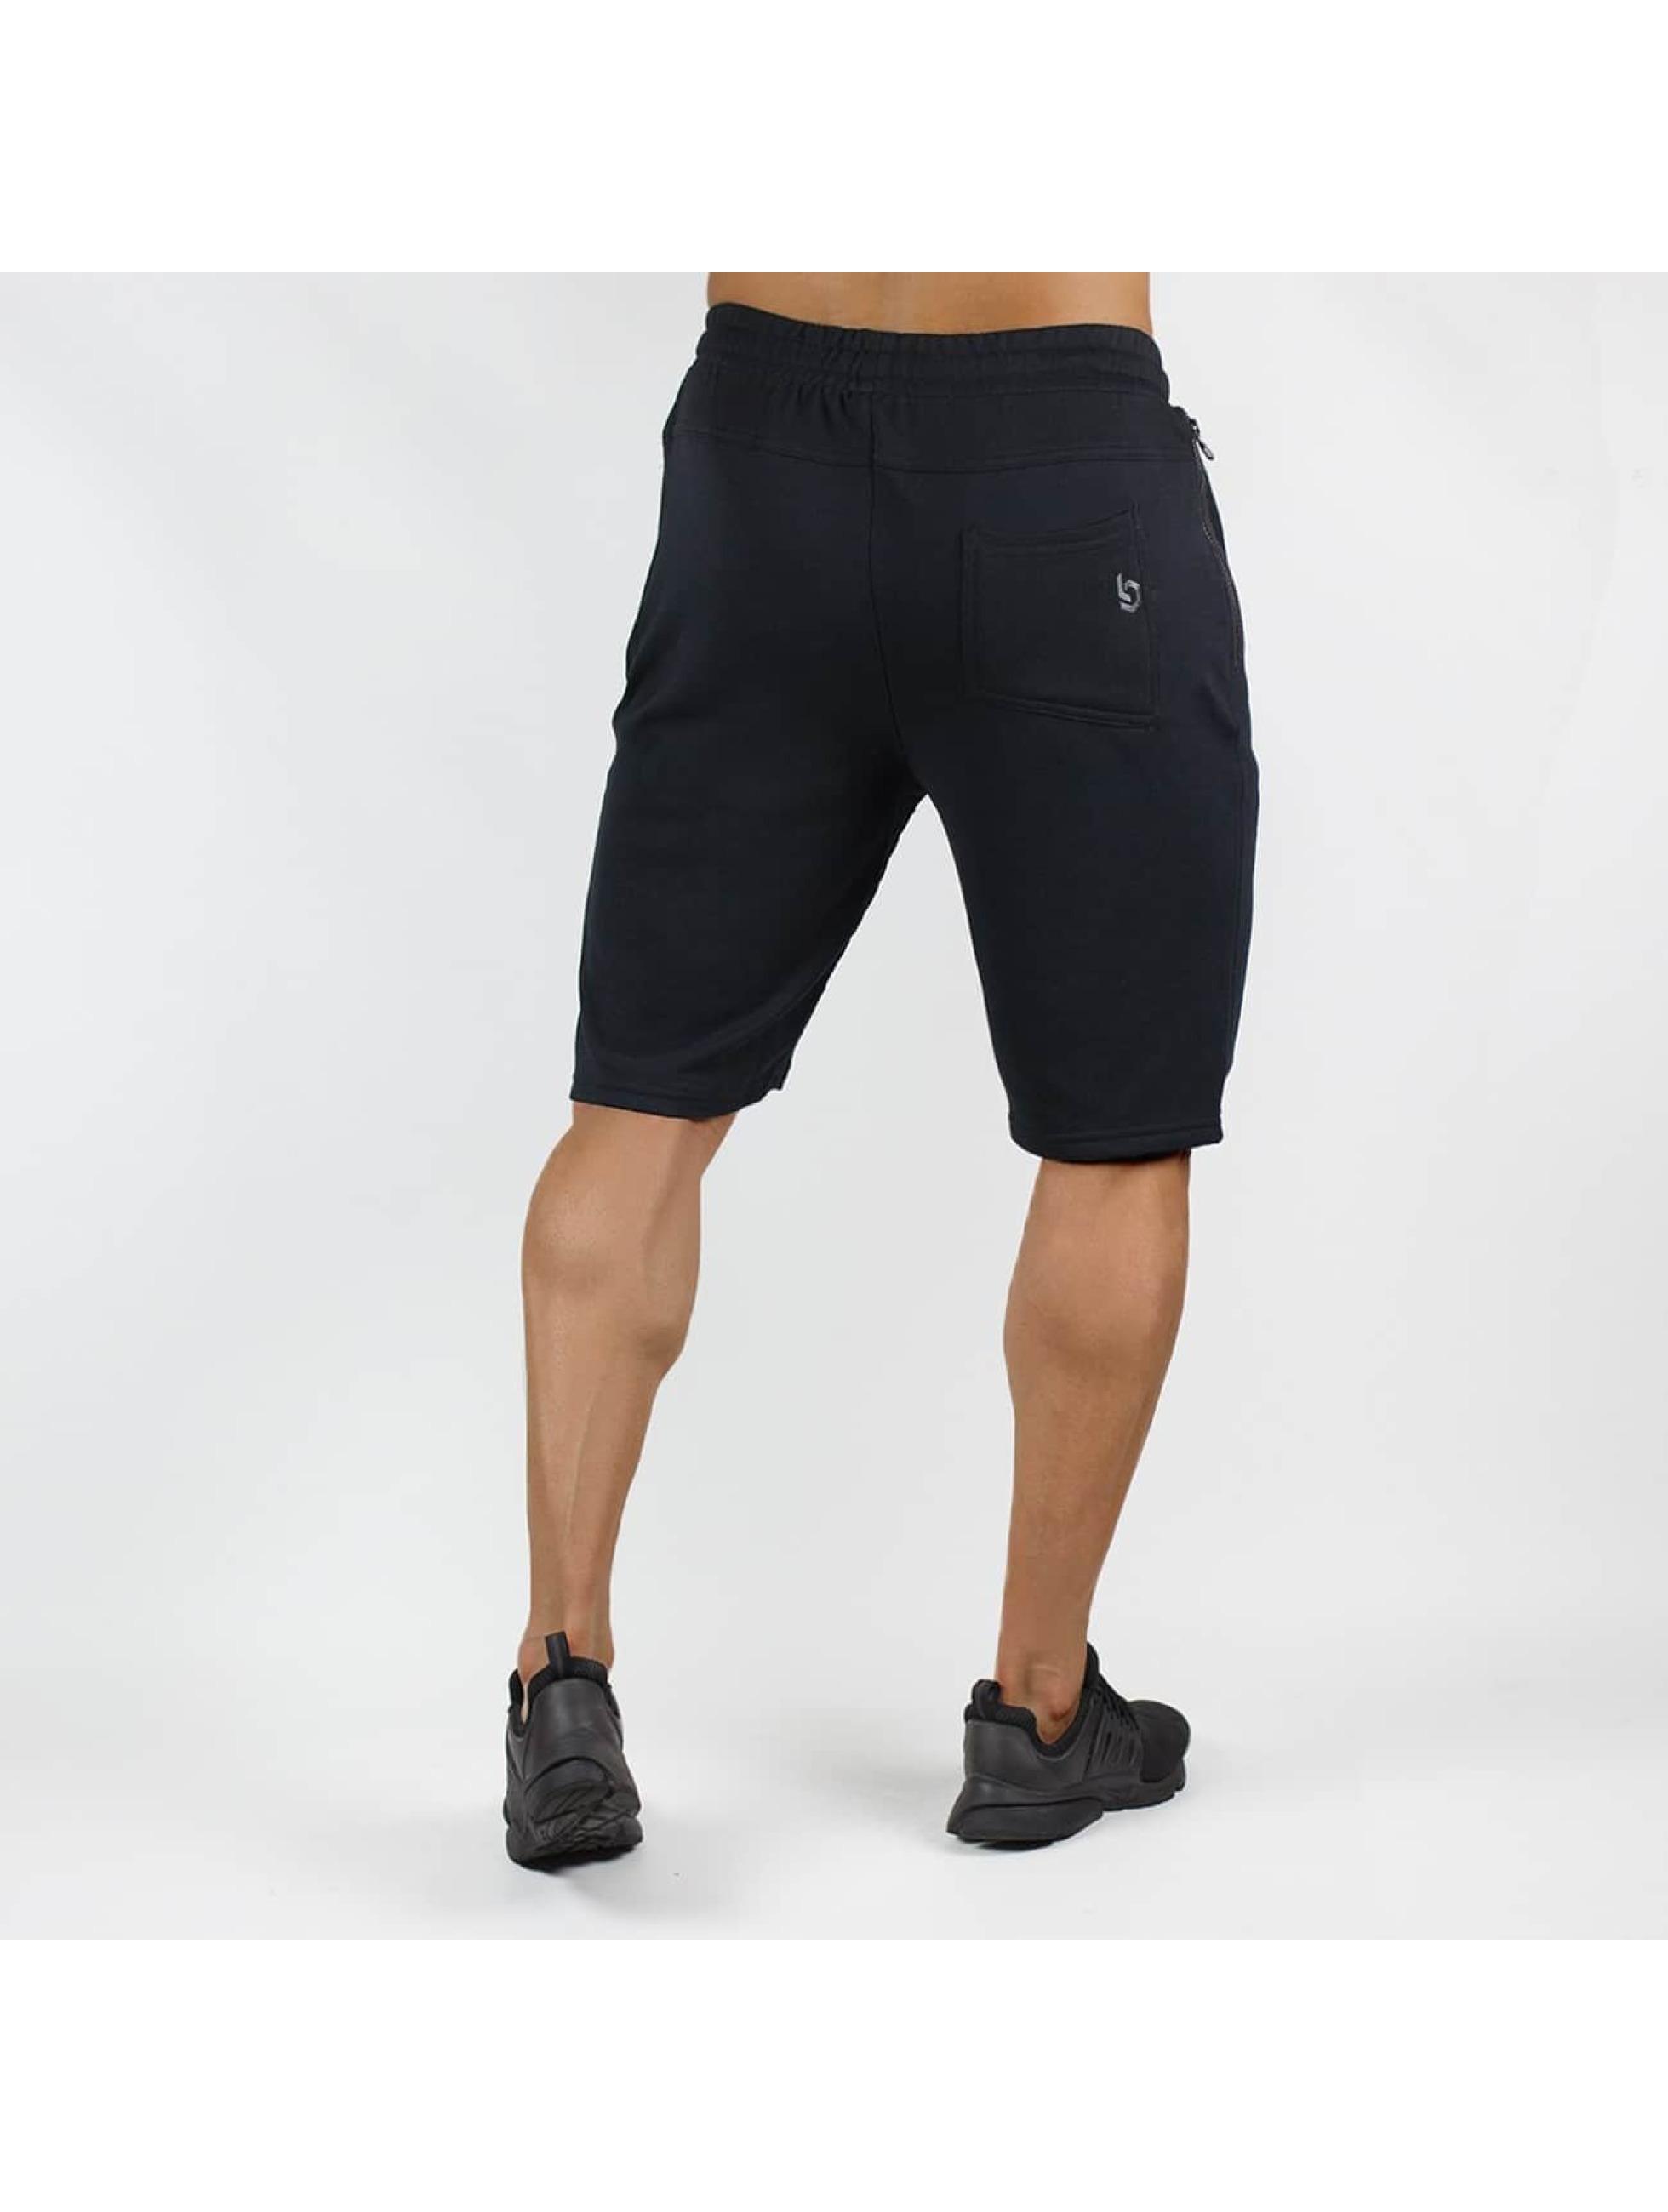 Beyond Limits Shorts Baseline nero